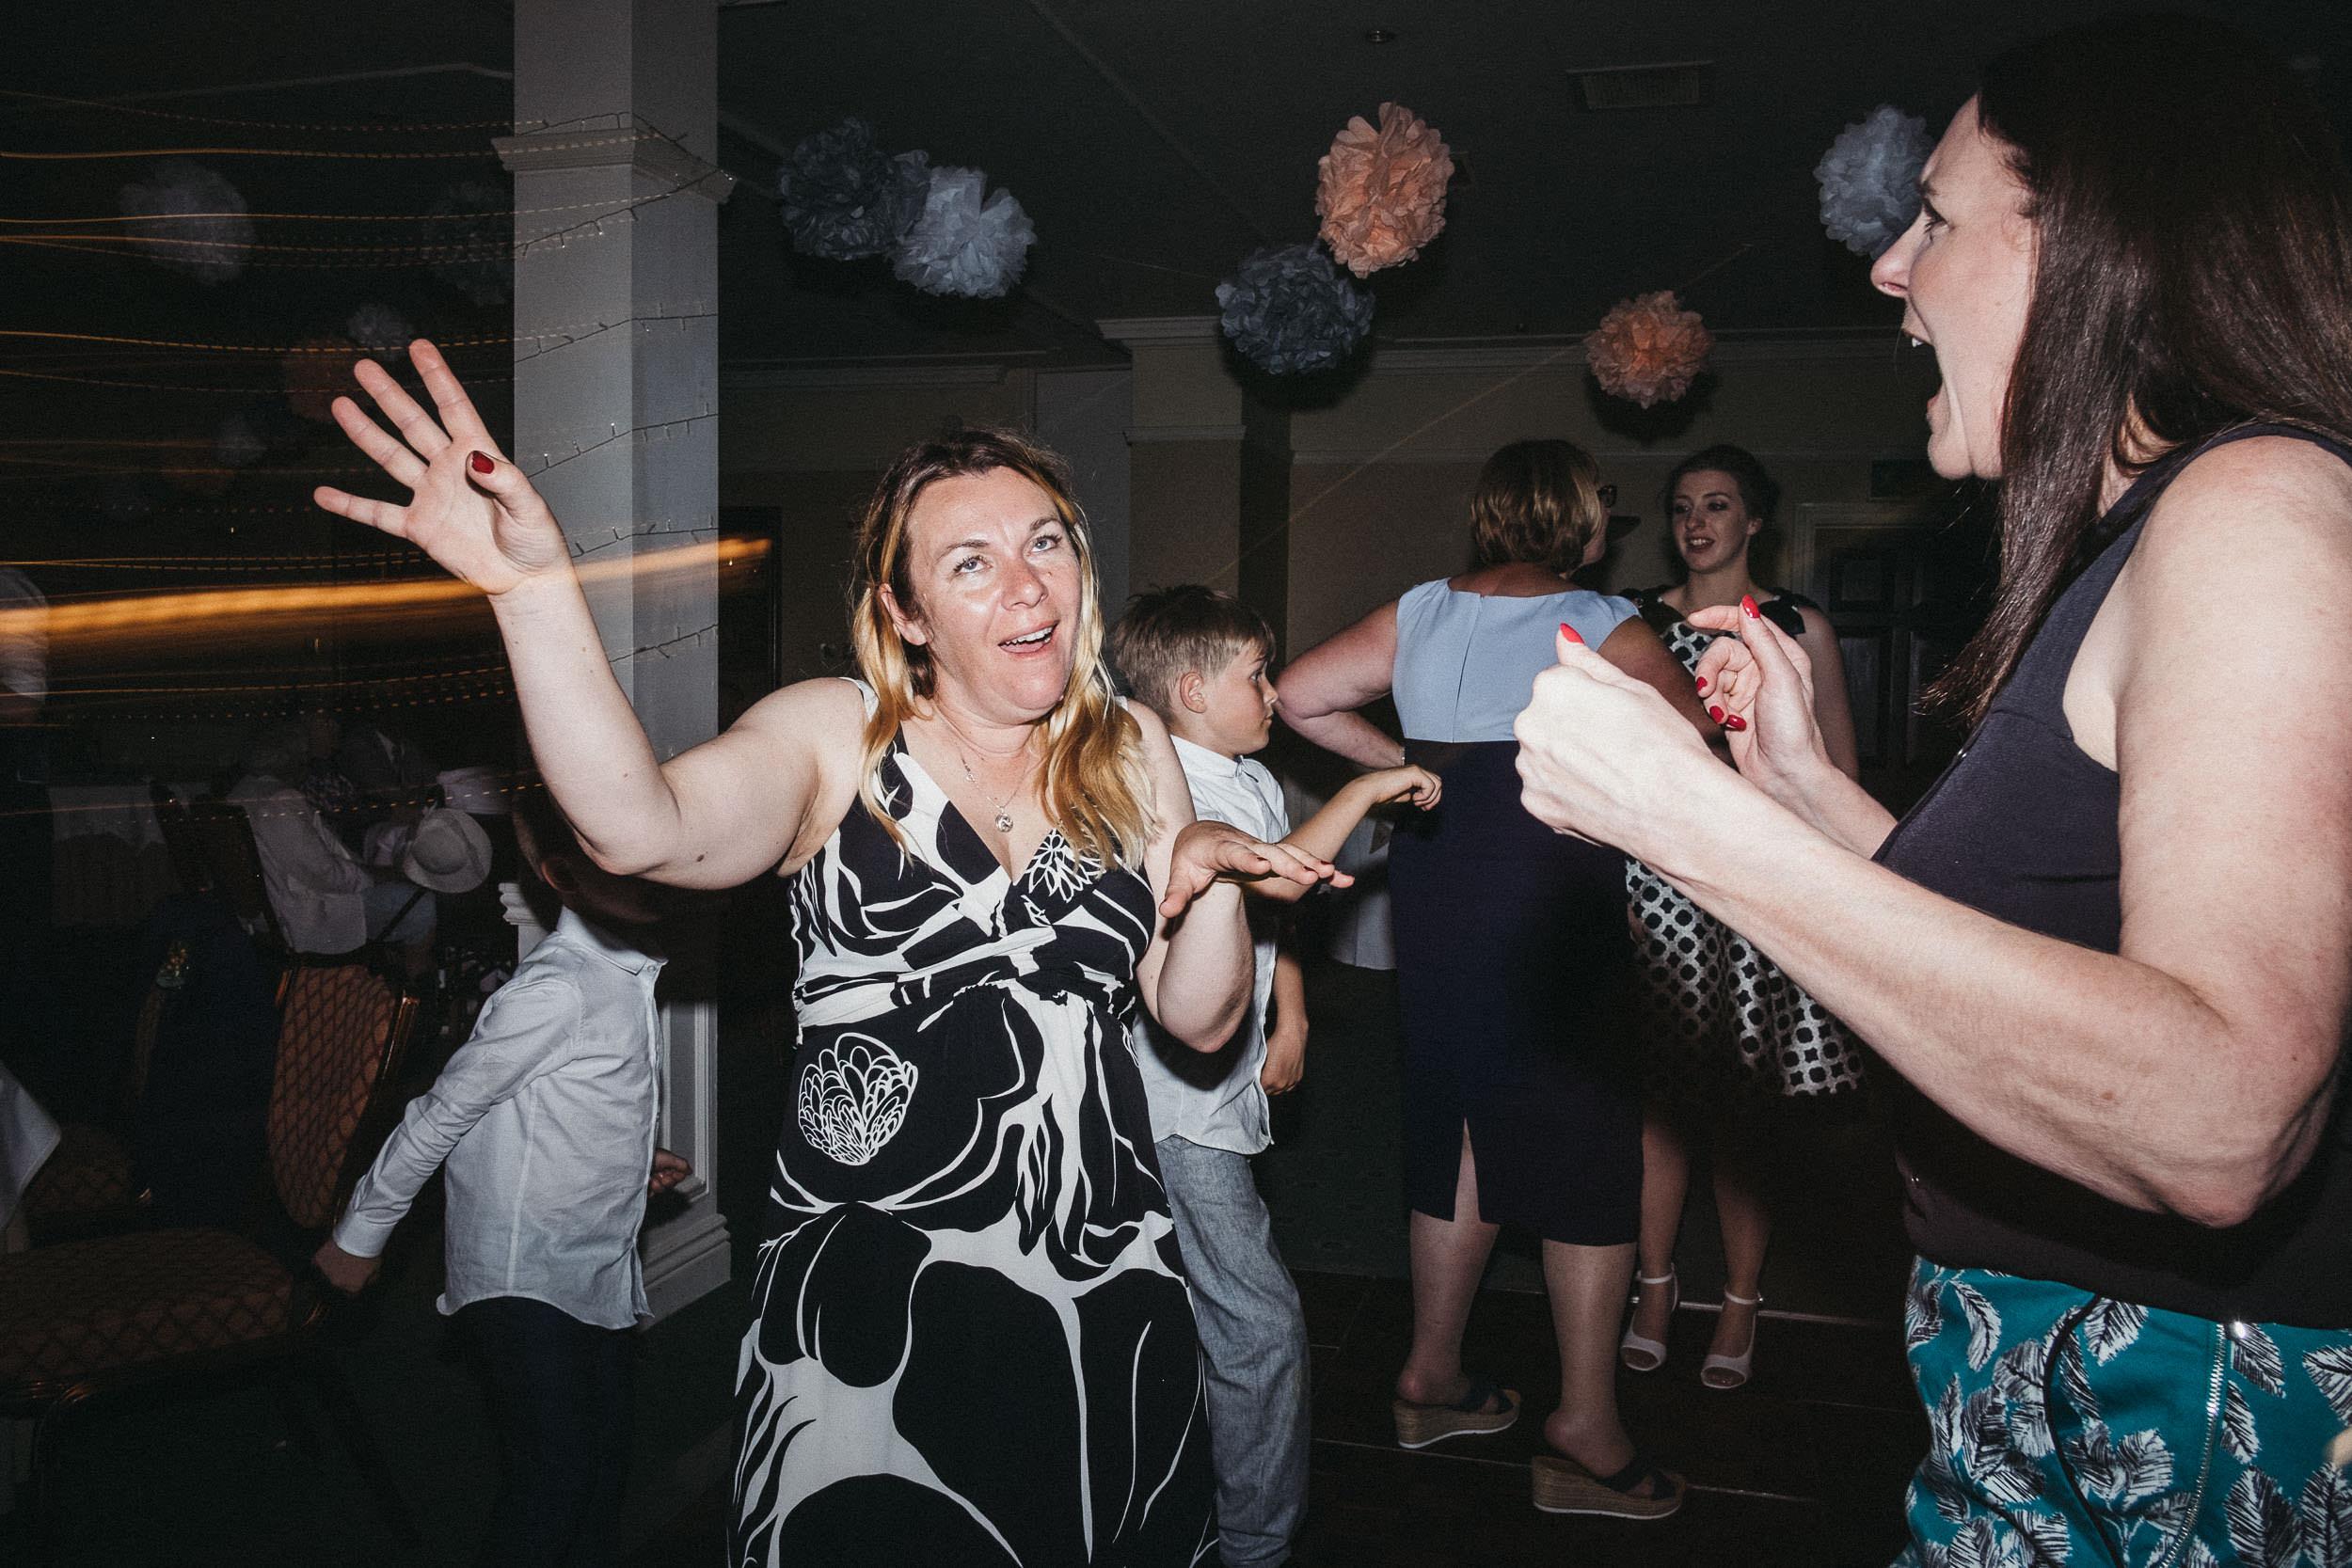 Wedding guest pulls funny face on dance floor